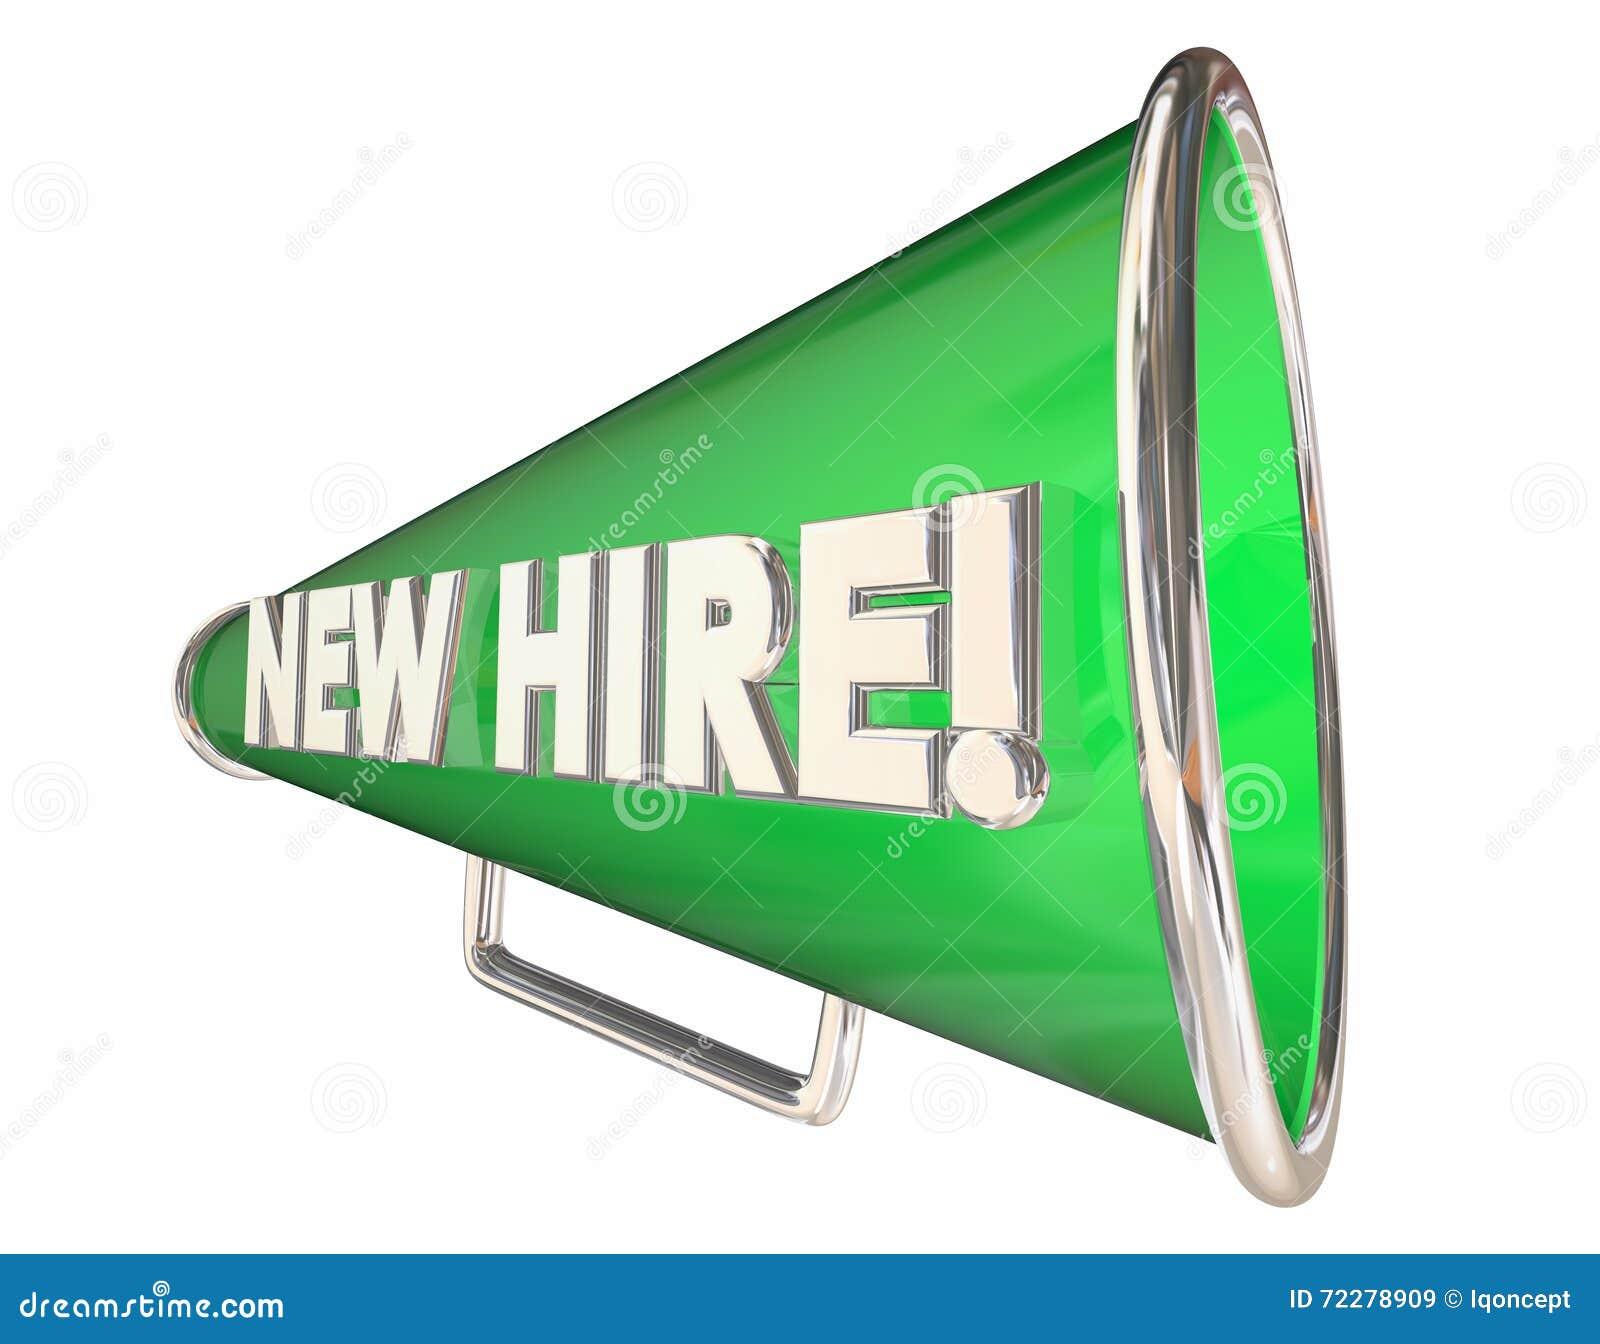 New hire bullhorn megaphone employee welcome stock illustration new hire bullhorn megaphone employee welcome m4hsunfo